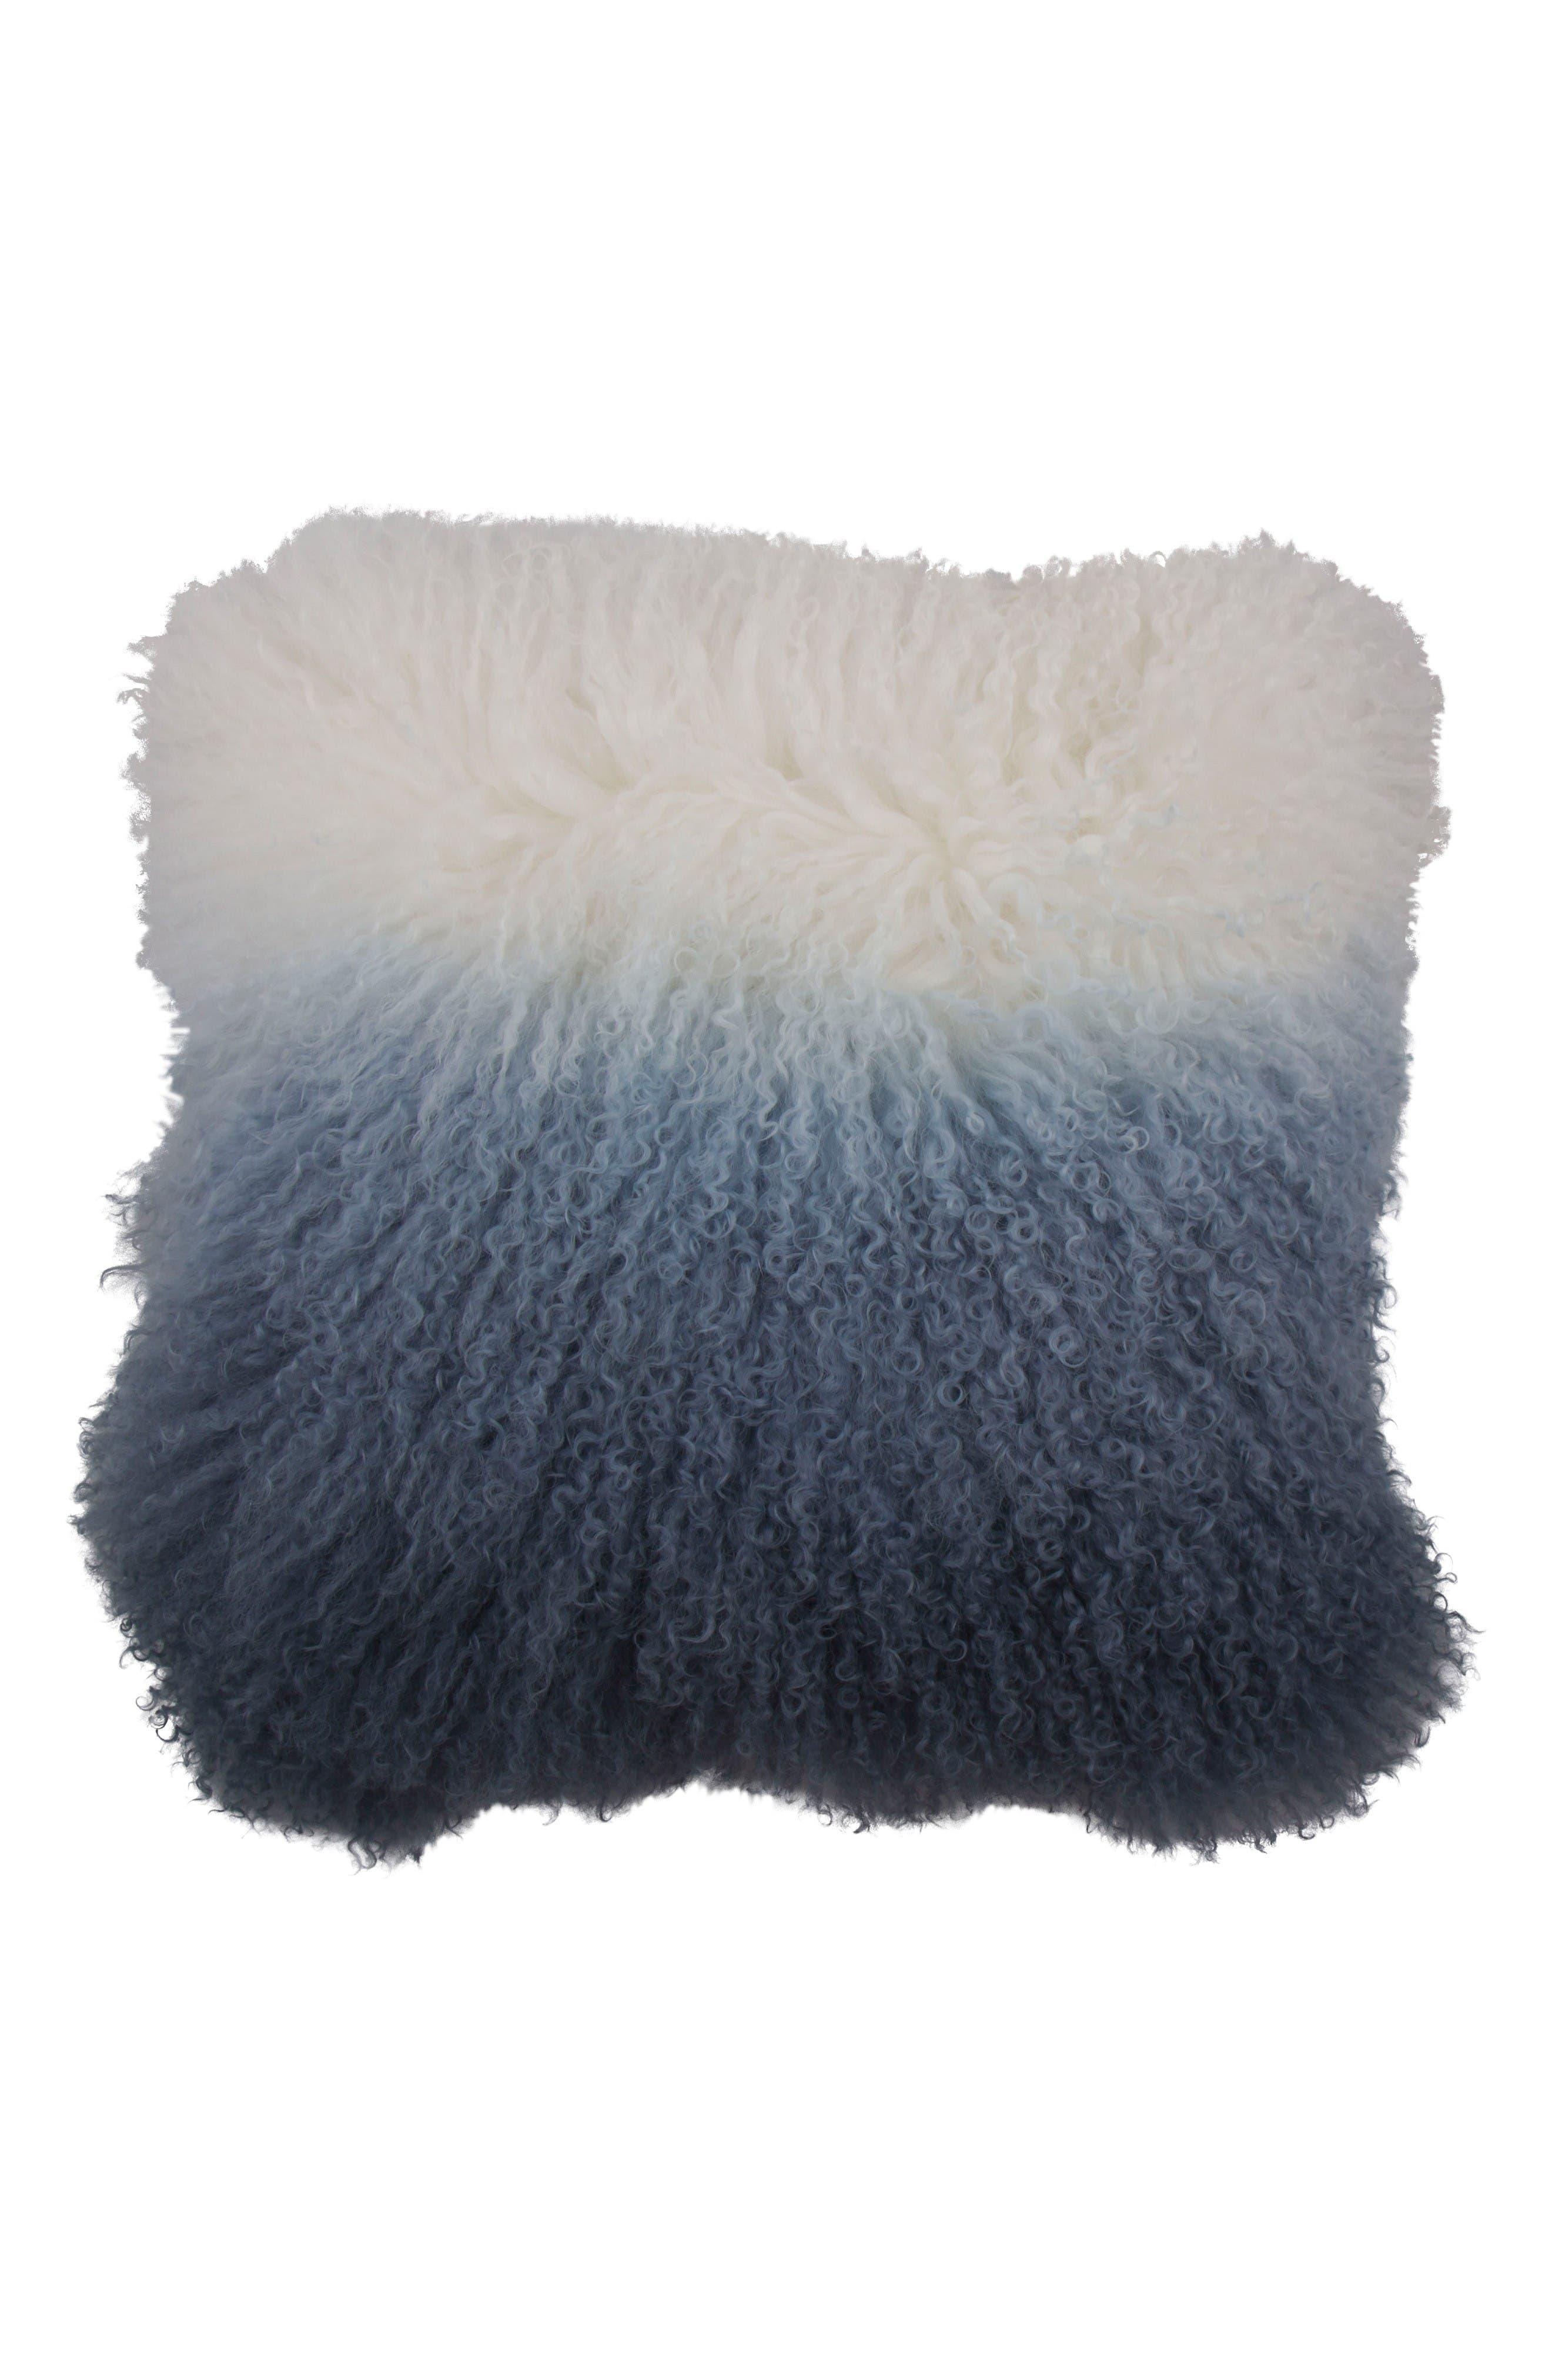 Main Image - Eightmood Genuine Shearling Pillow